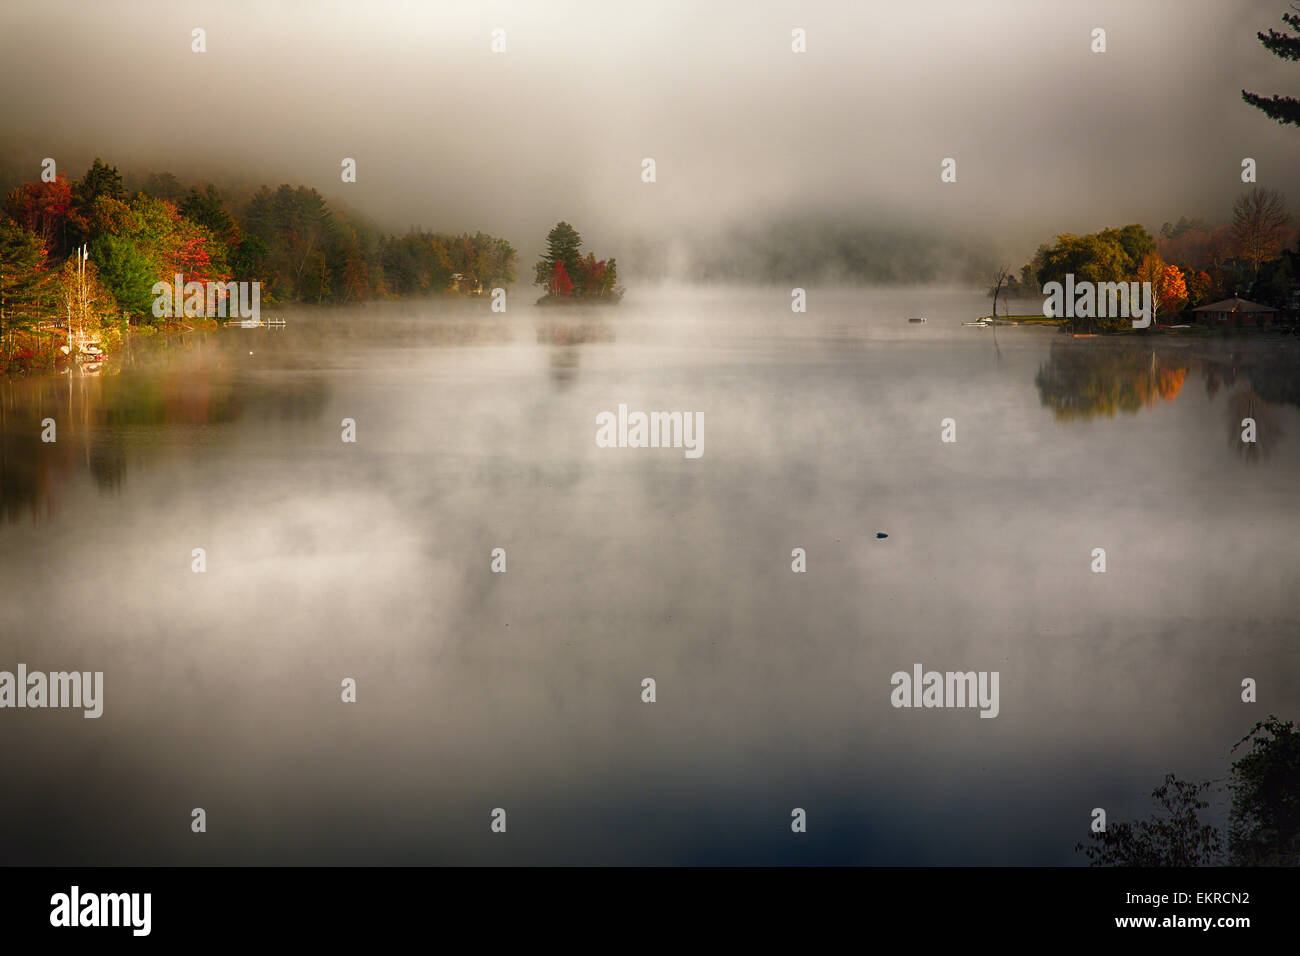 High Angle View of Lake mit Morgennebel im Herbst, Knapp Brook Pond, Vermont Stockbild